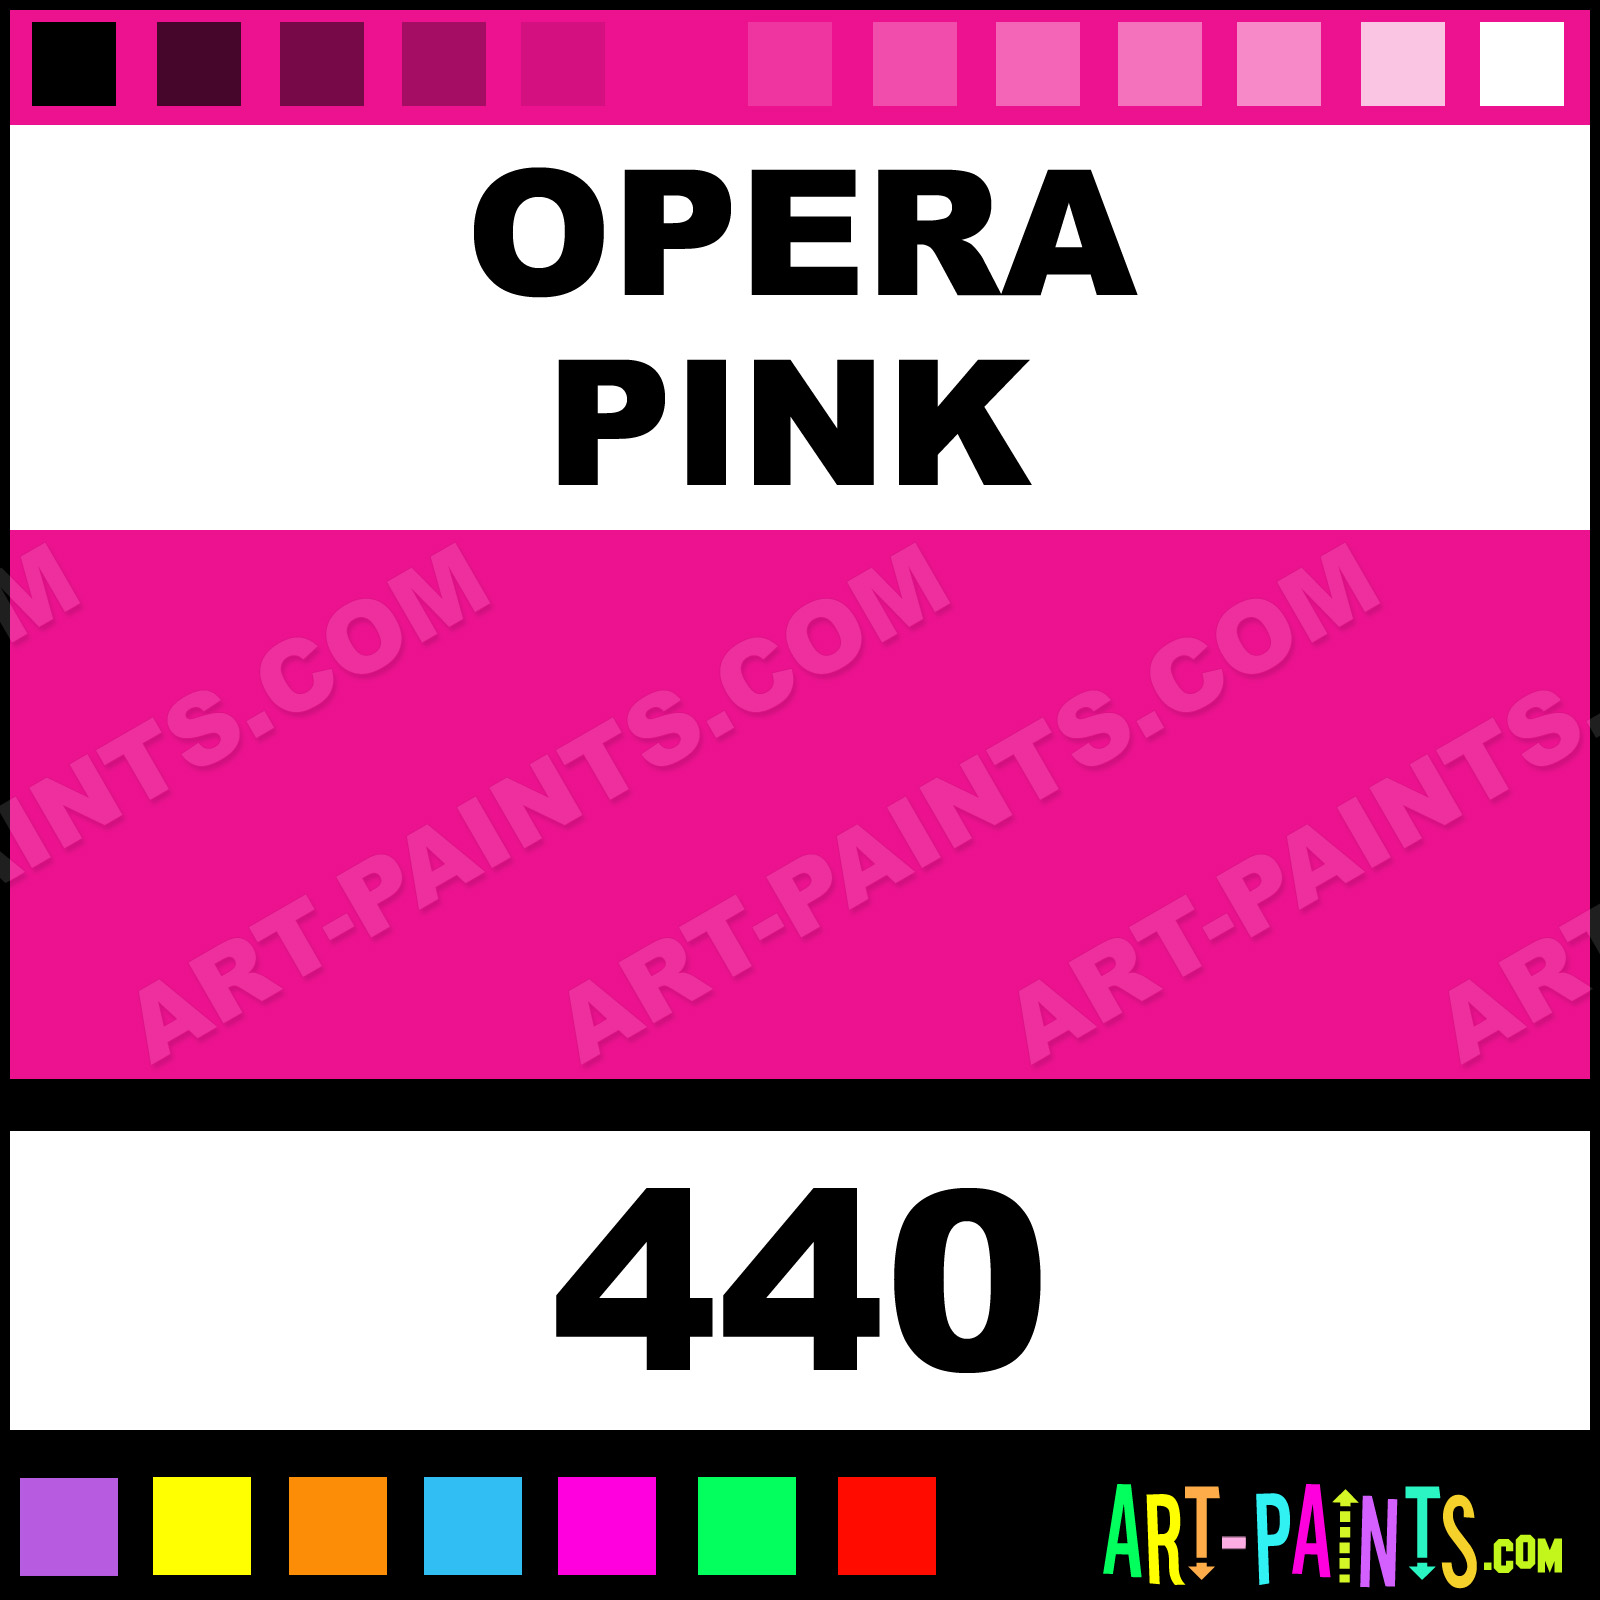 Opera Pink Designers Gouache Calligraphy Inks Pigments